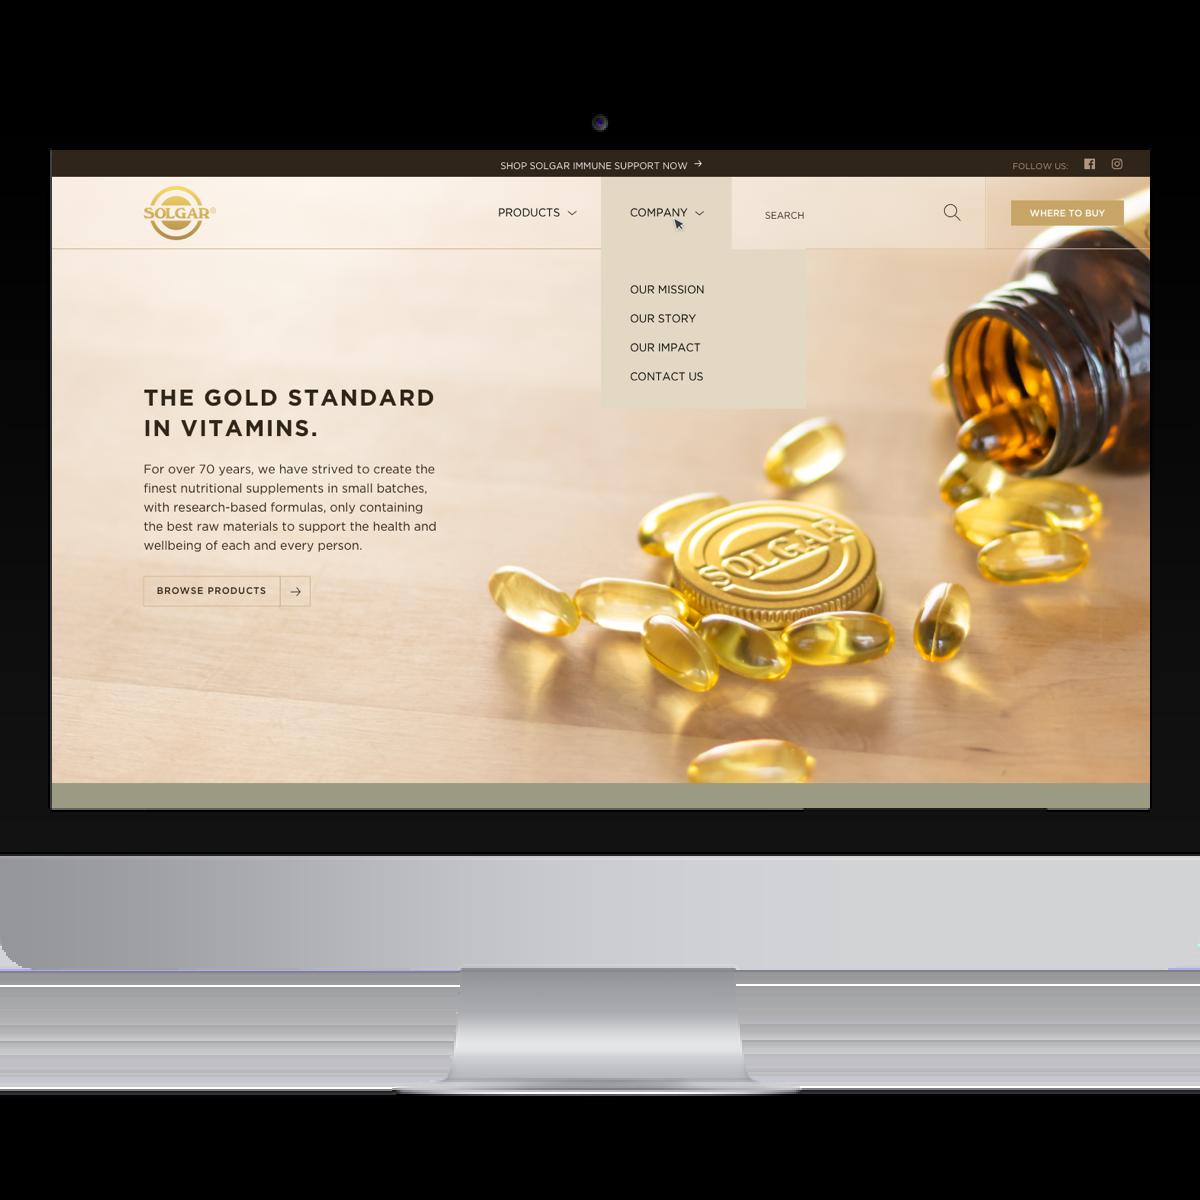 Solgars website after BSTRO